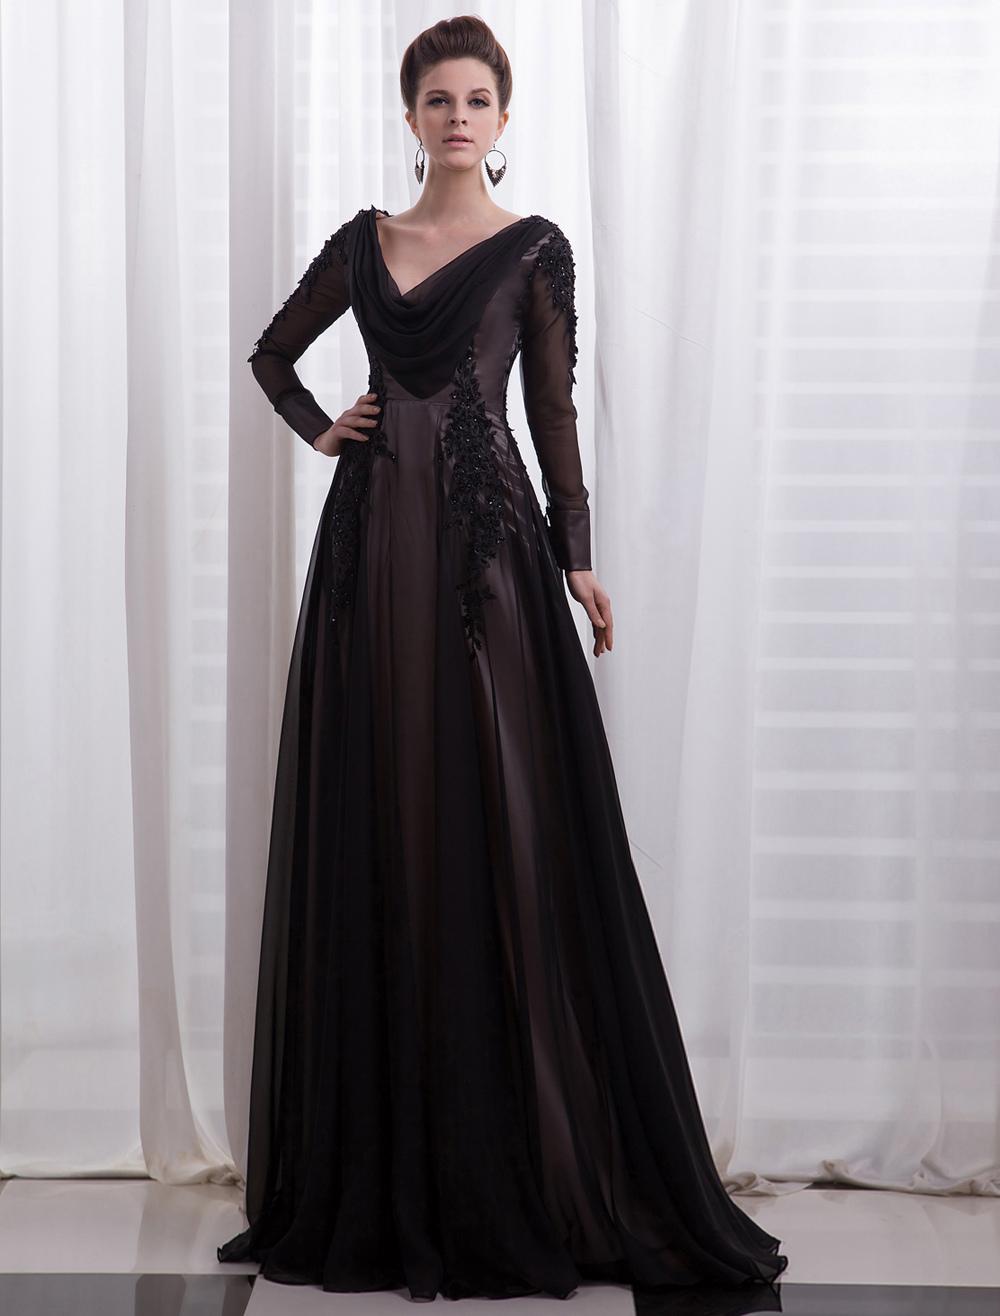 Black Evening Dress Deep-V Sequins Mesh Chiffon Prom Dress Milanoo